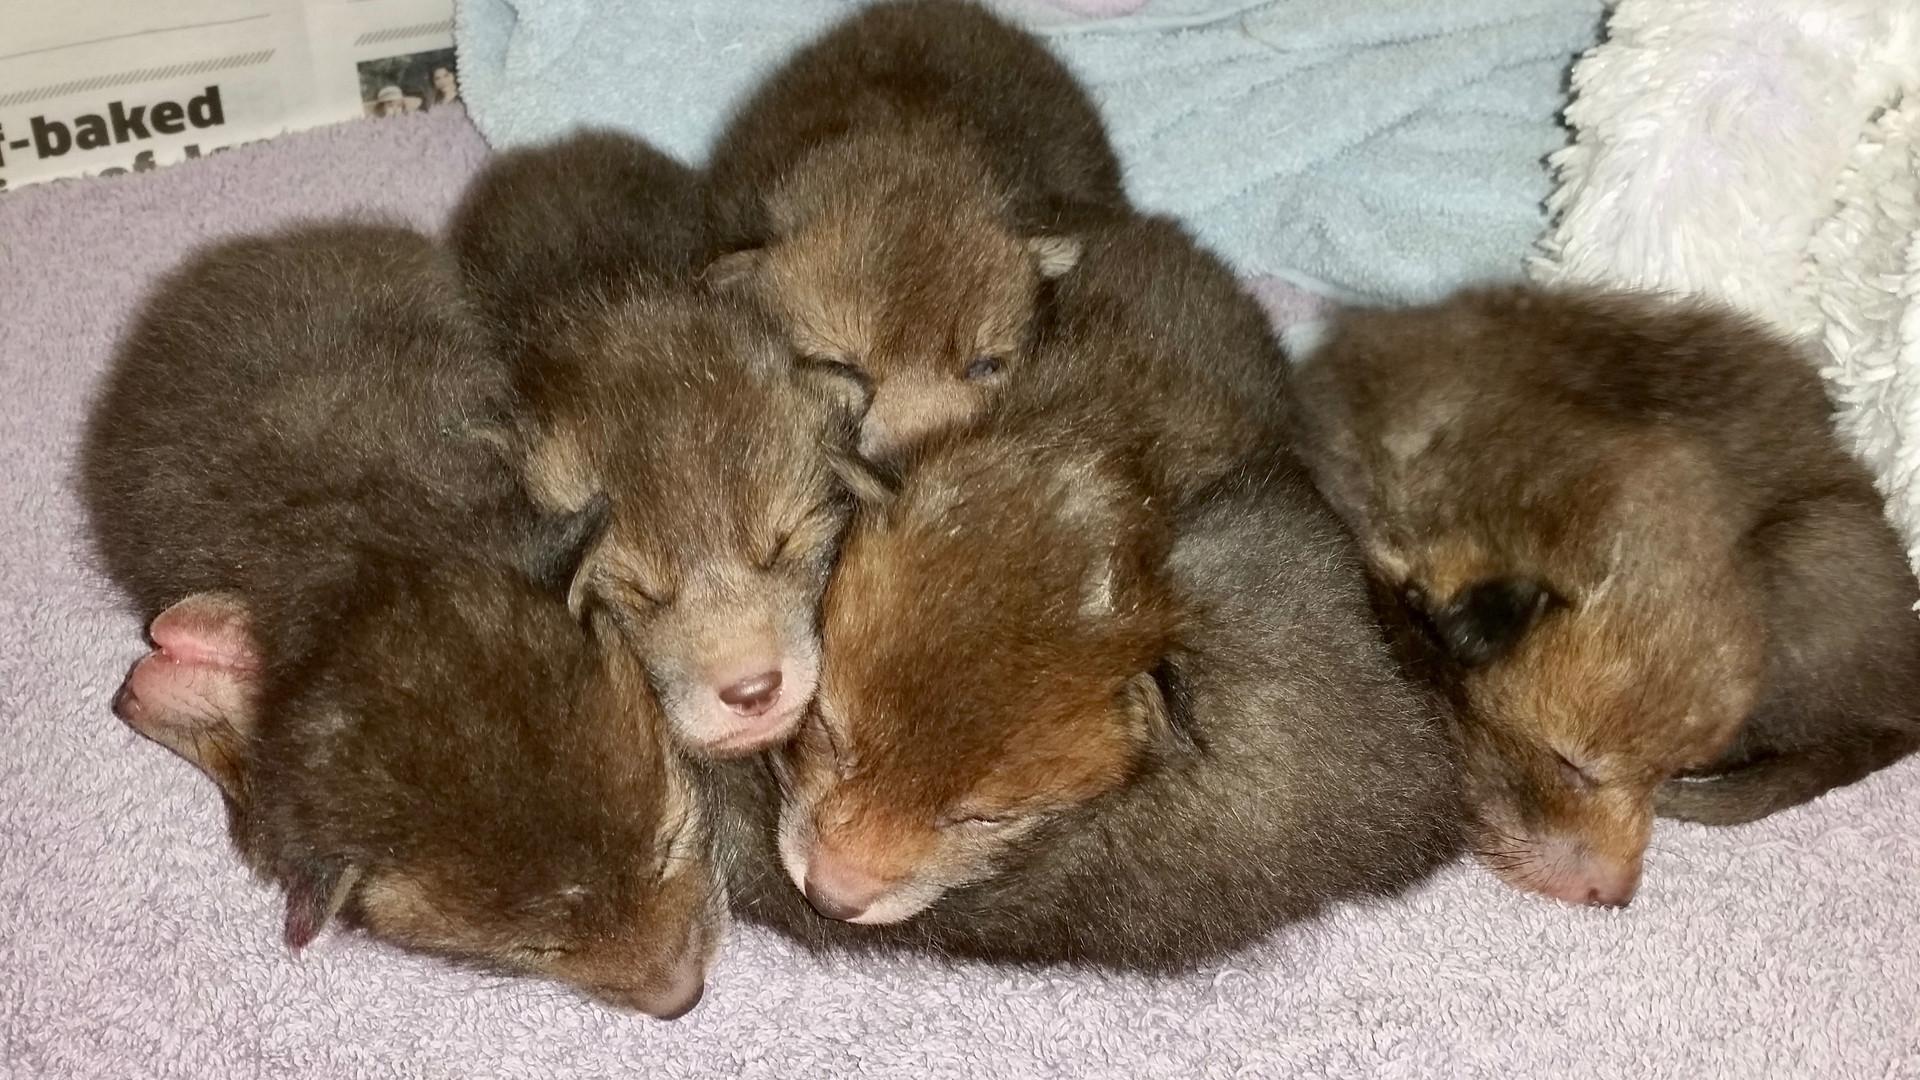 6 Baby Fox Cubs on Towels.jpg